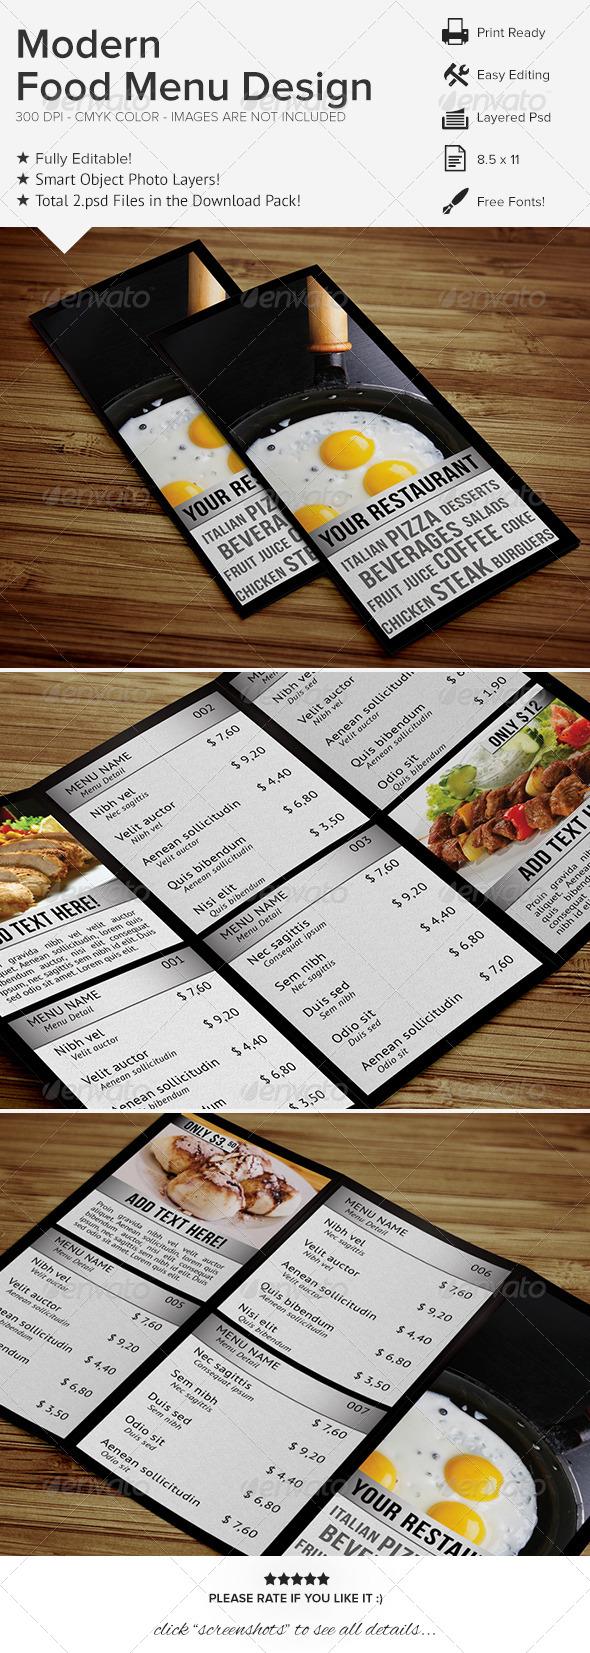 Modern Food Menu Design